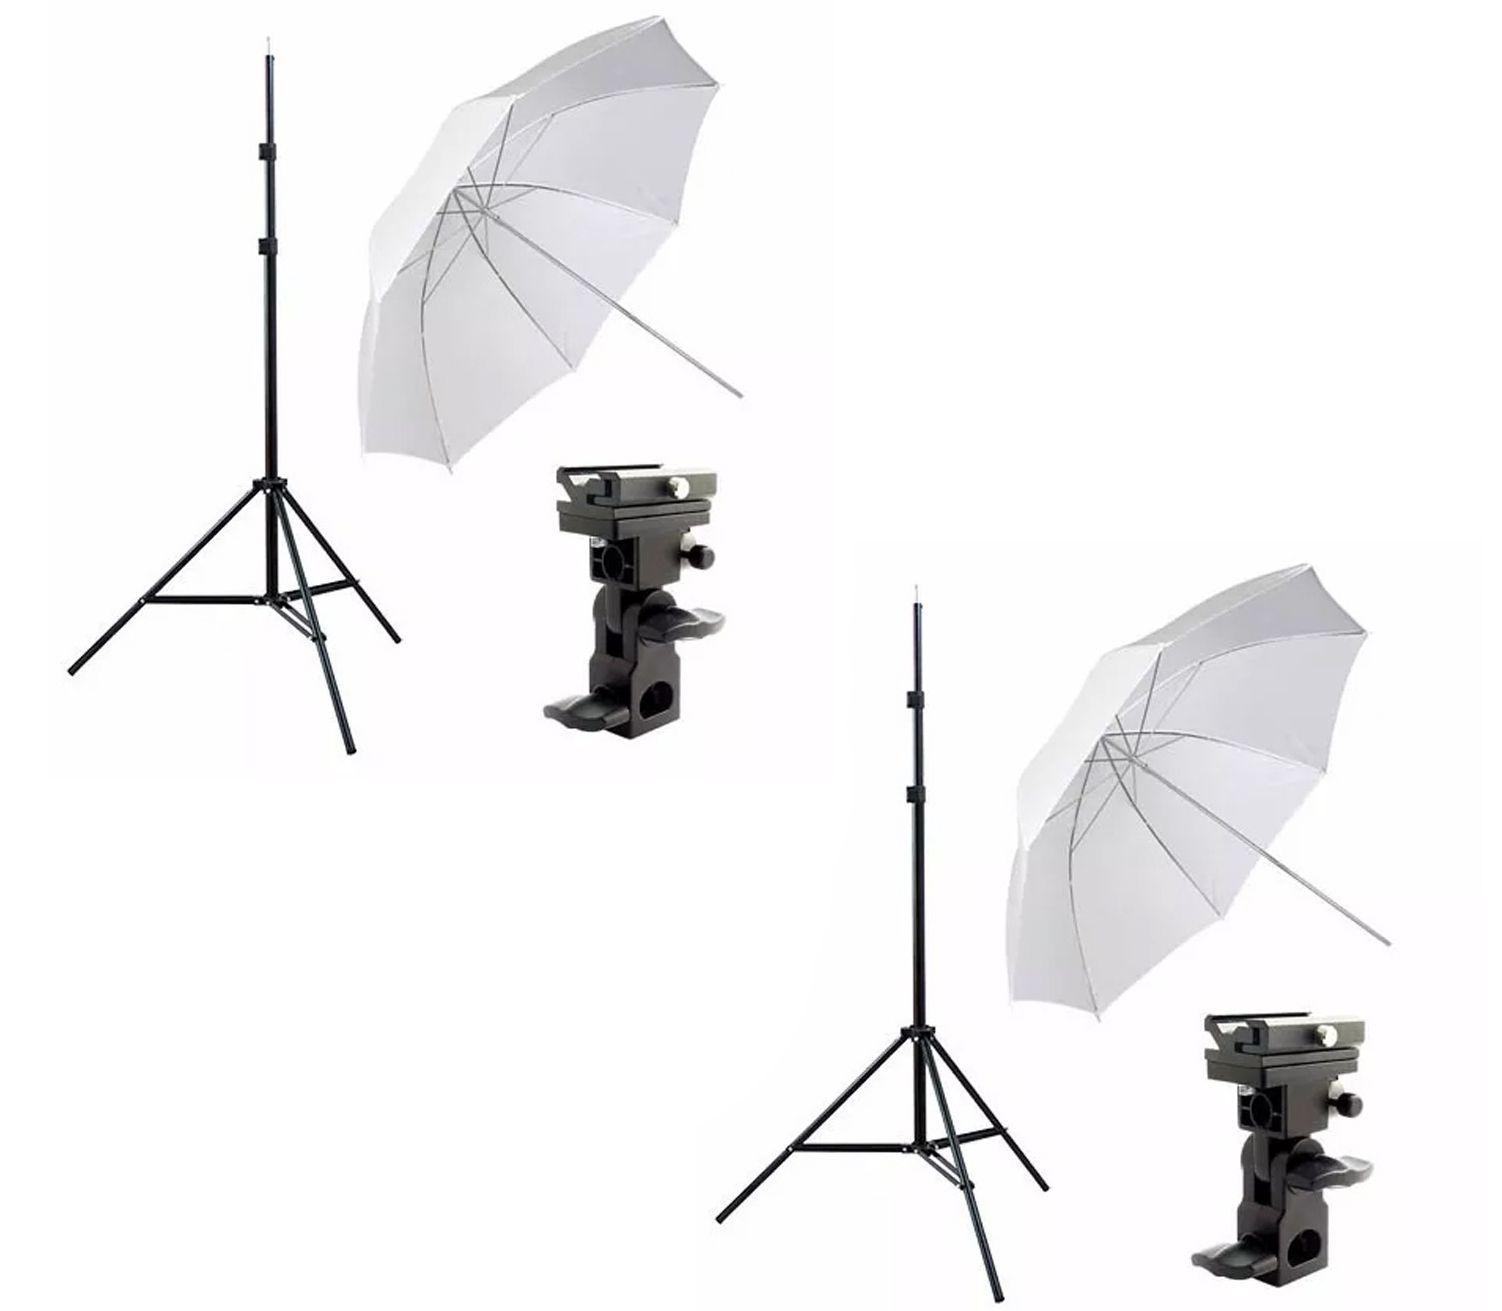 fotografia+porta+lente+e+flash+kit+suspensorio+3+cases+lentes+ ... 7452b006696